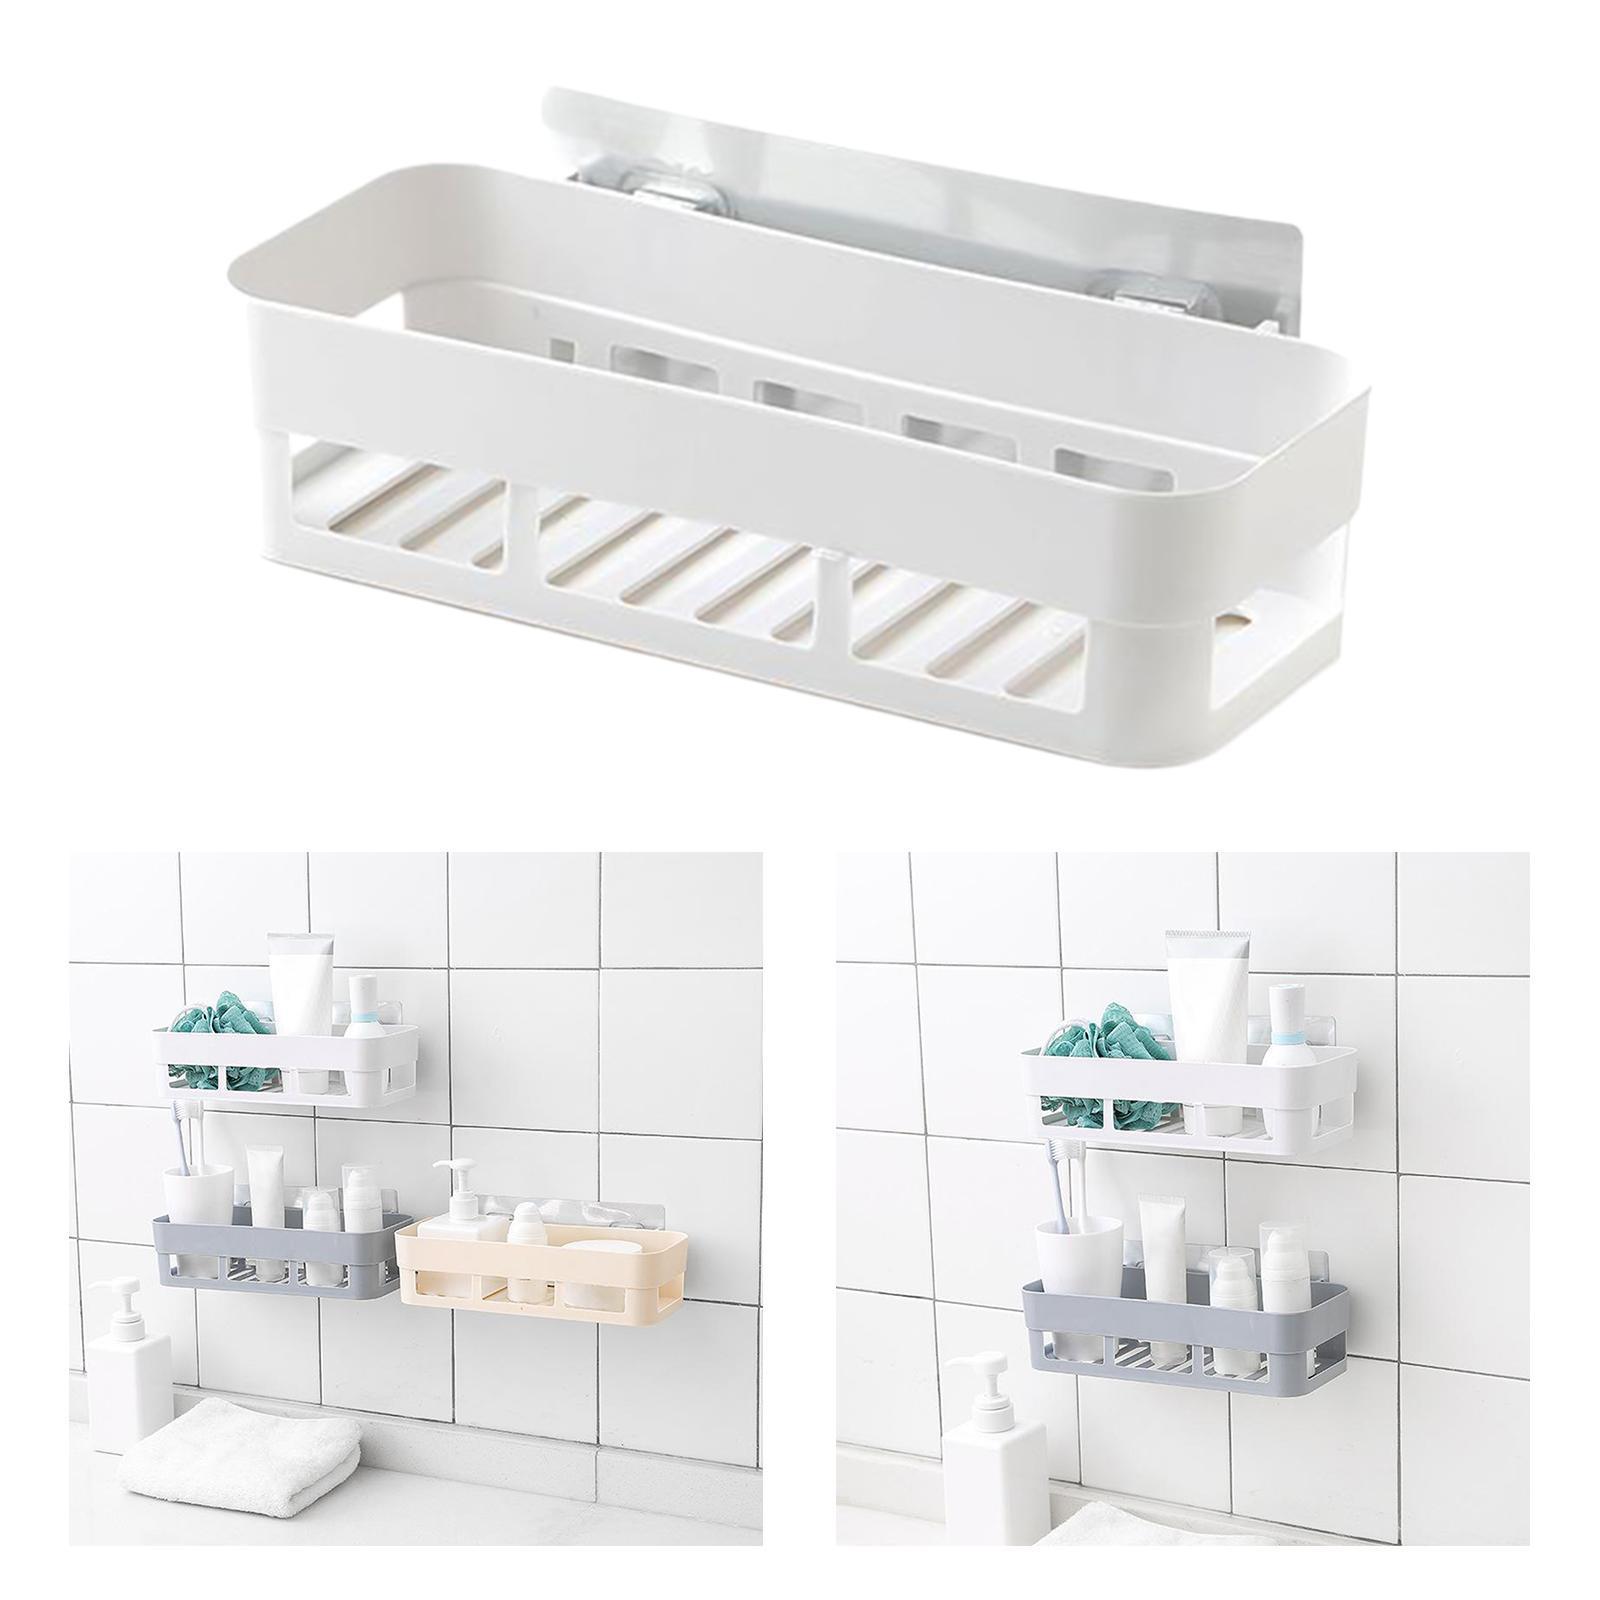 thumbnail 4 - Wall-Suction-Bathroom-Shelf-Shower-Caddy-Wall-Mount-Storage-Rack-Organizer